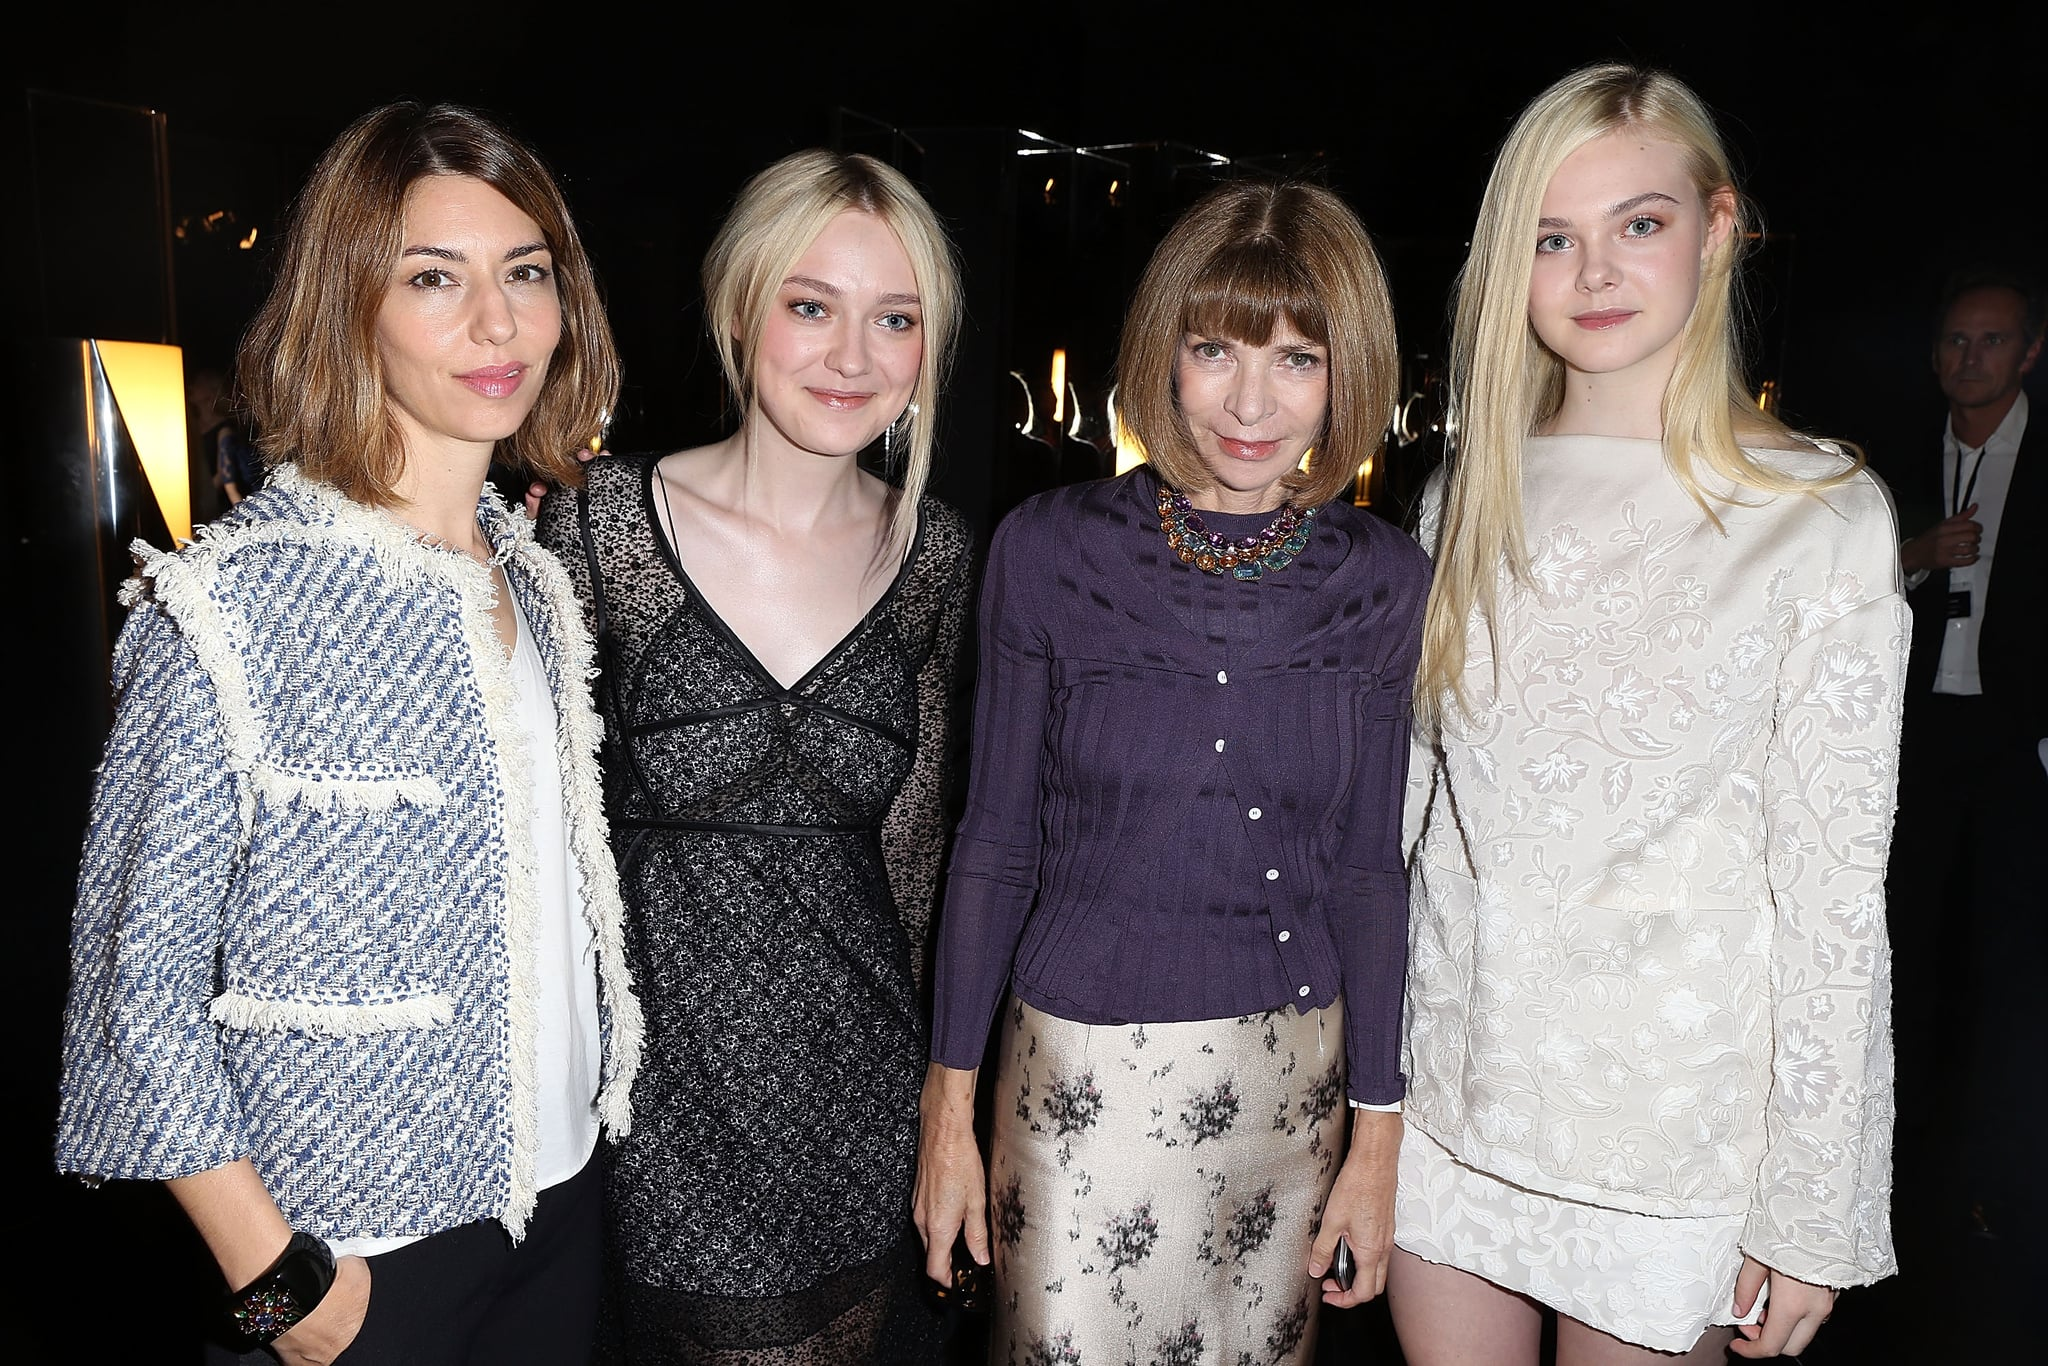 Sofia Coppola, Dakota Fanning, and Elle Fanning